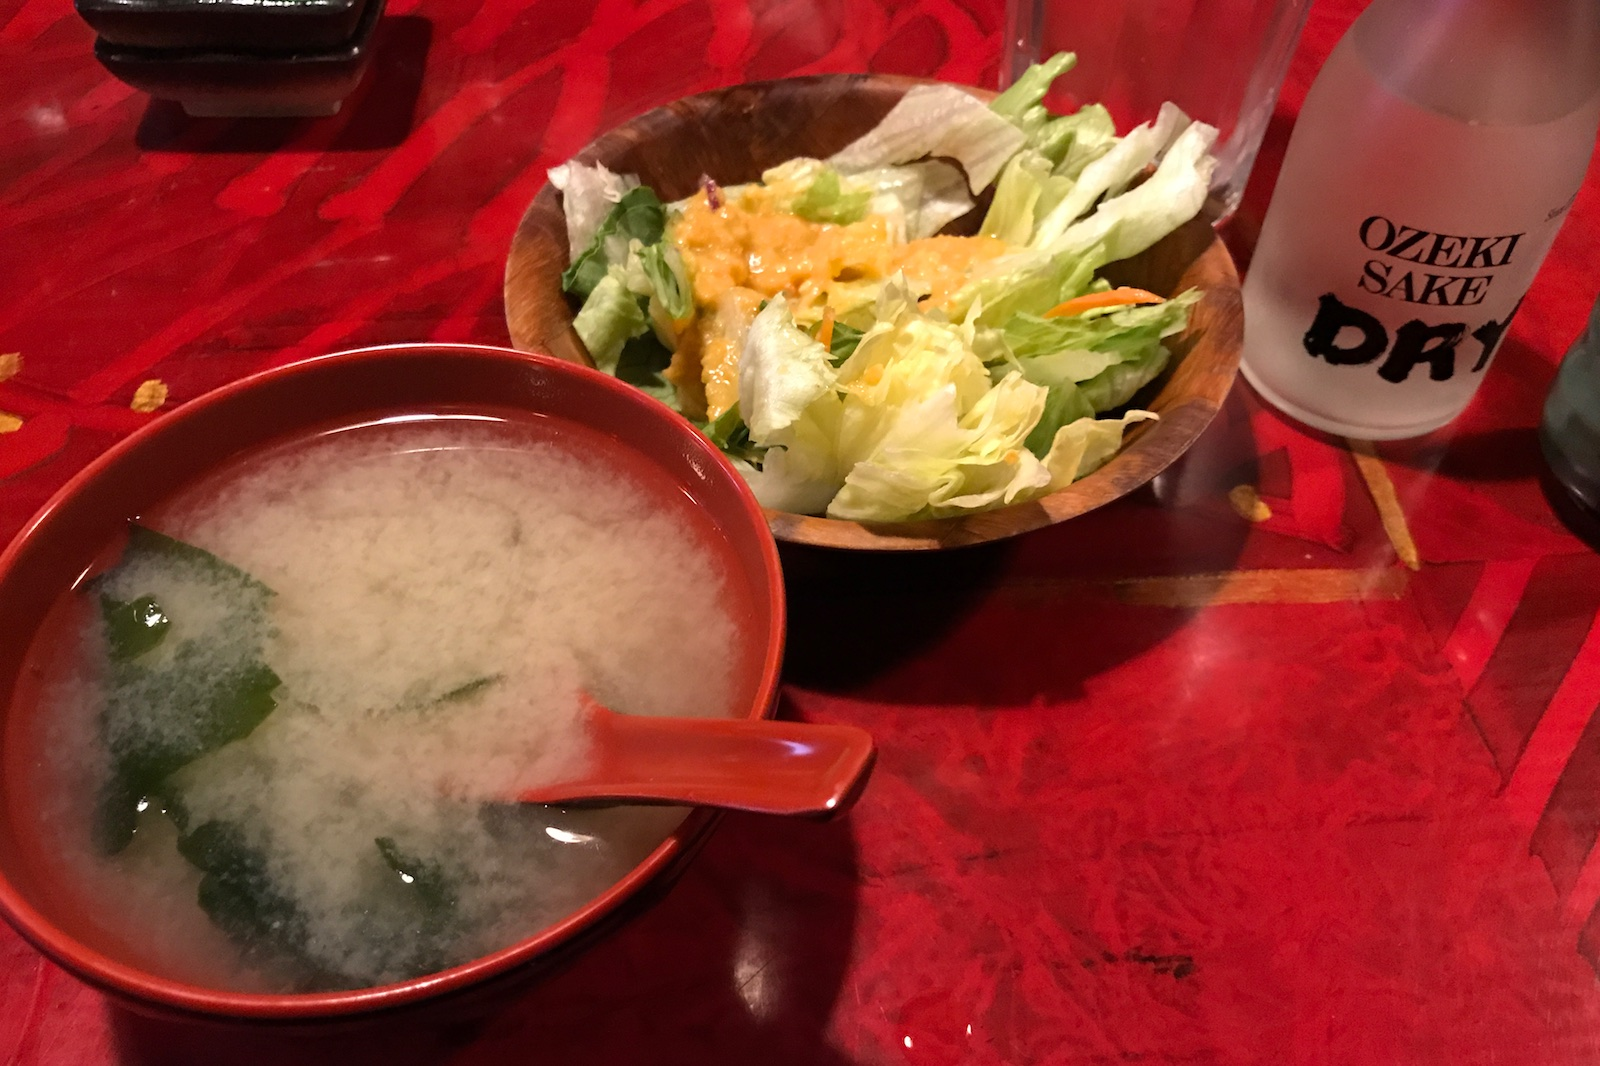 http://blog.rickk.com/food/2017/04/15/ate.2017.04.11.d1.jpg